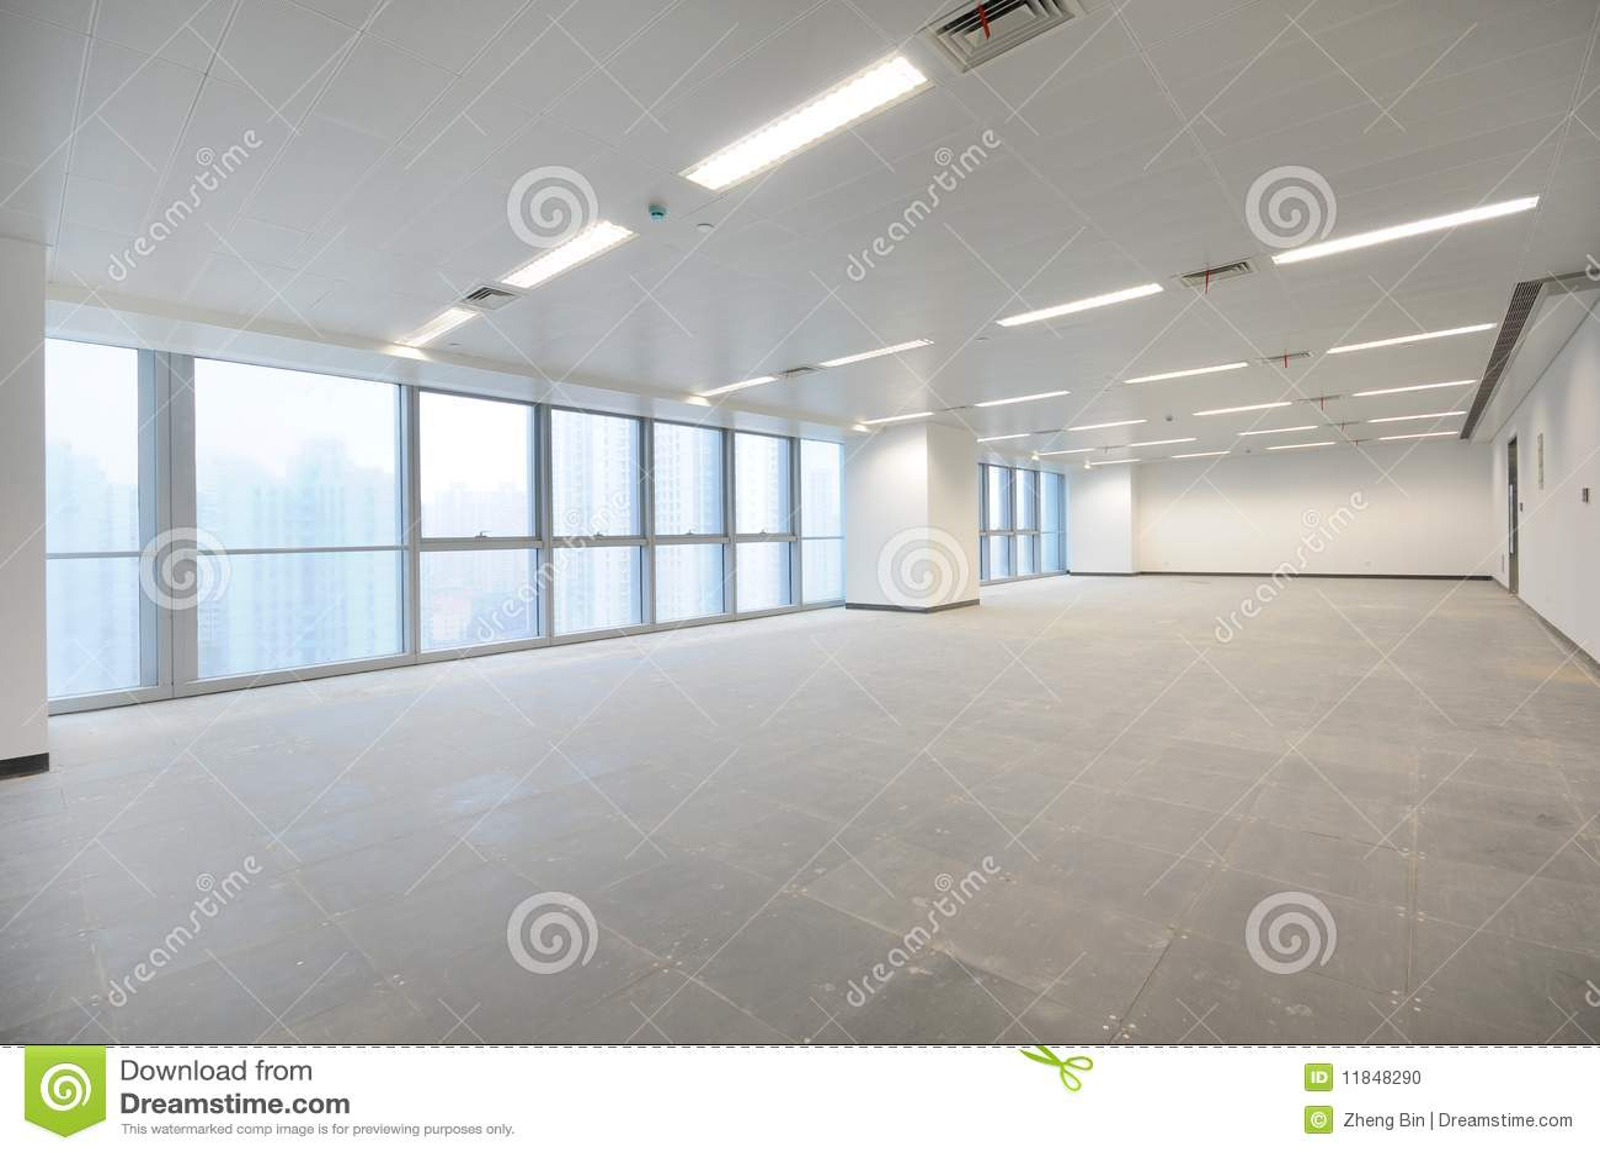 empty office room stock photo image of plate dish fresh 11848290 rh dreamstime com Big Empty Office Room Big Empty Office Room